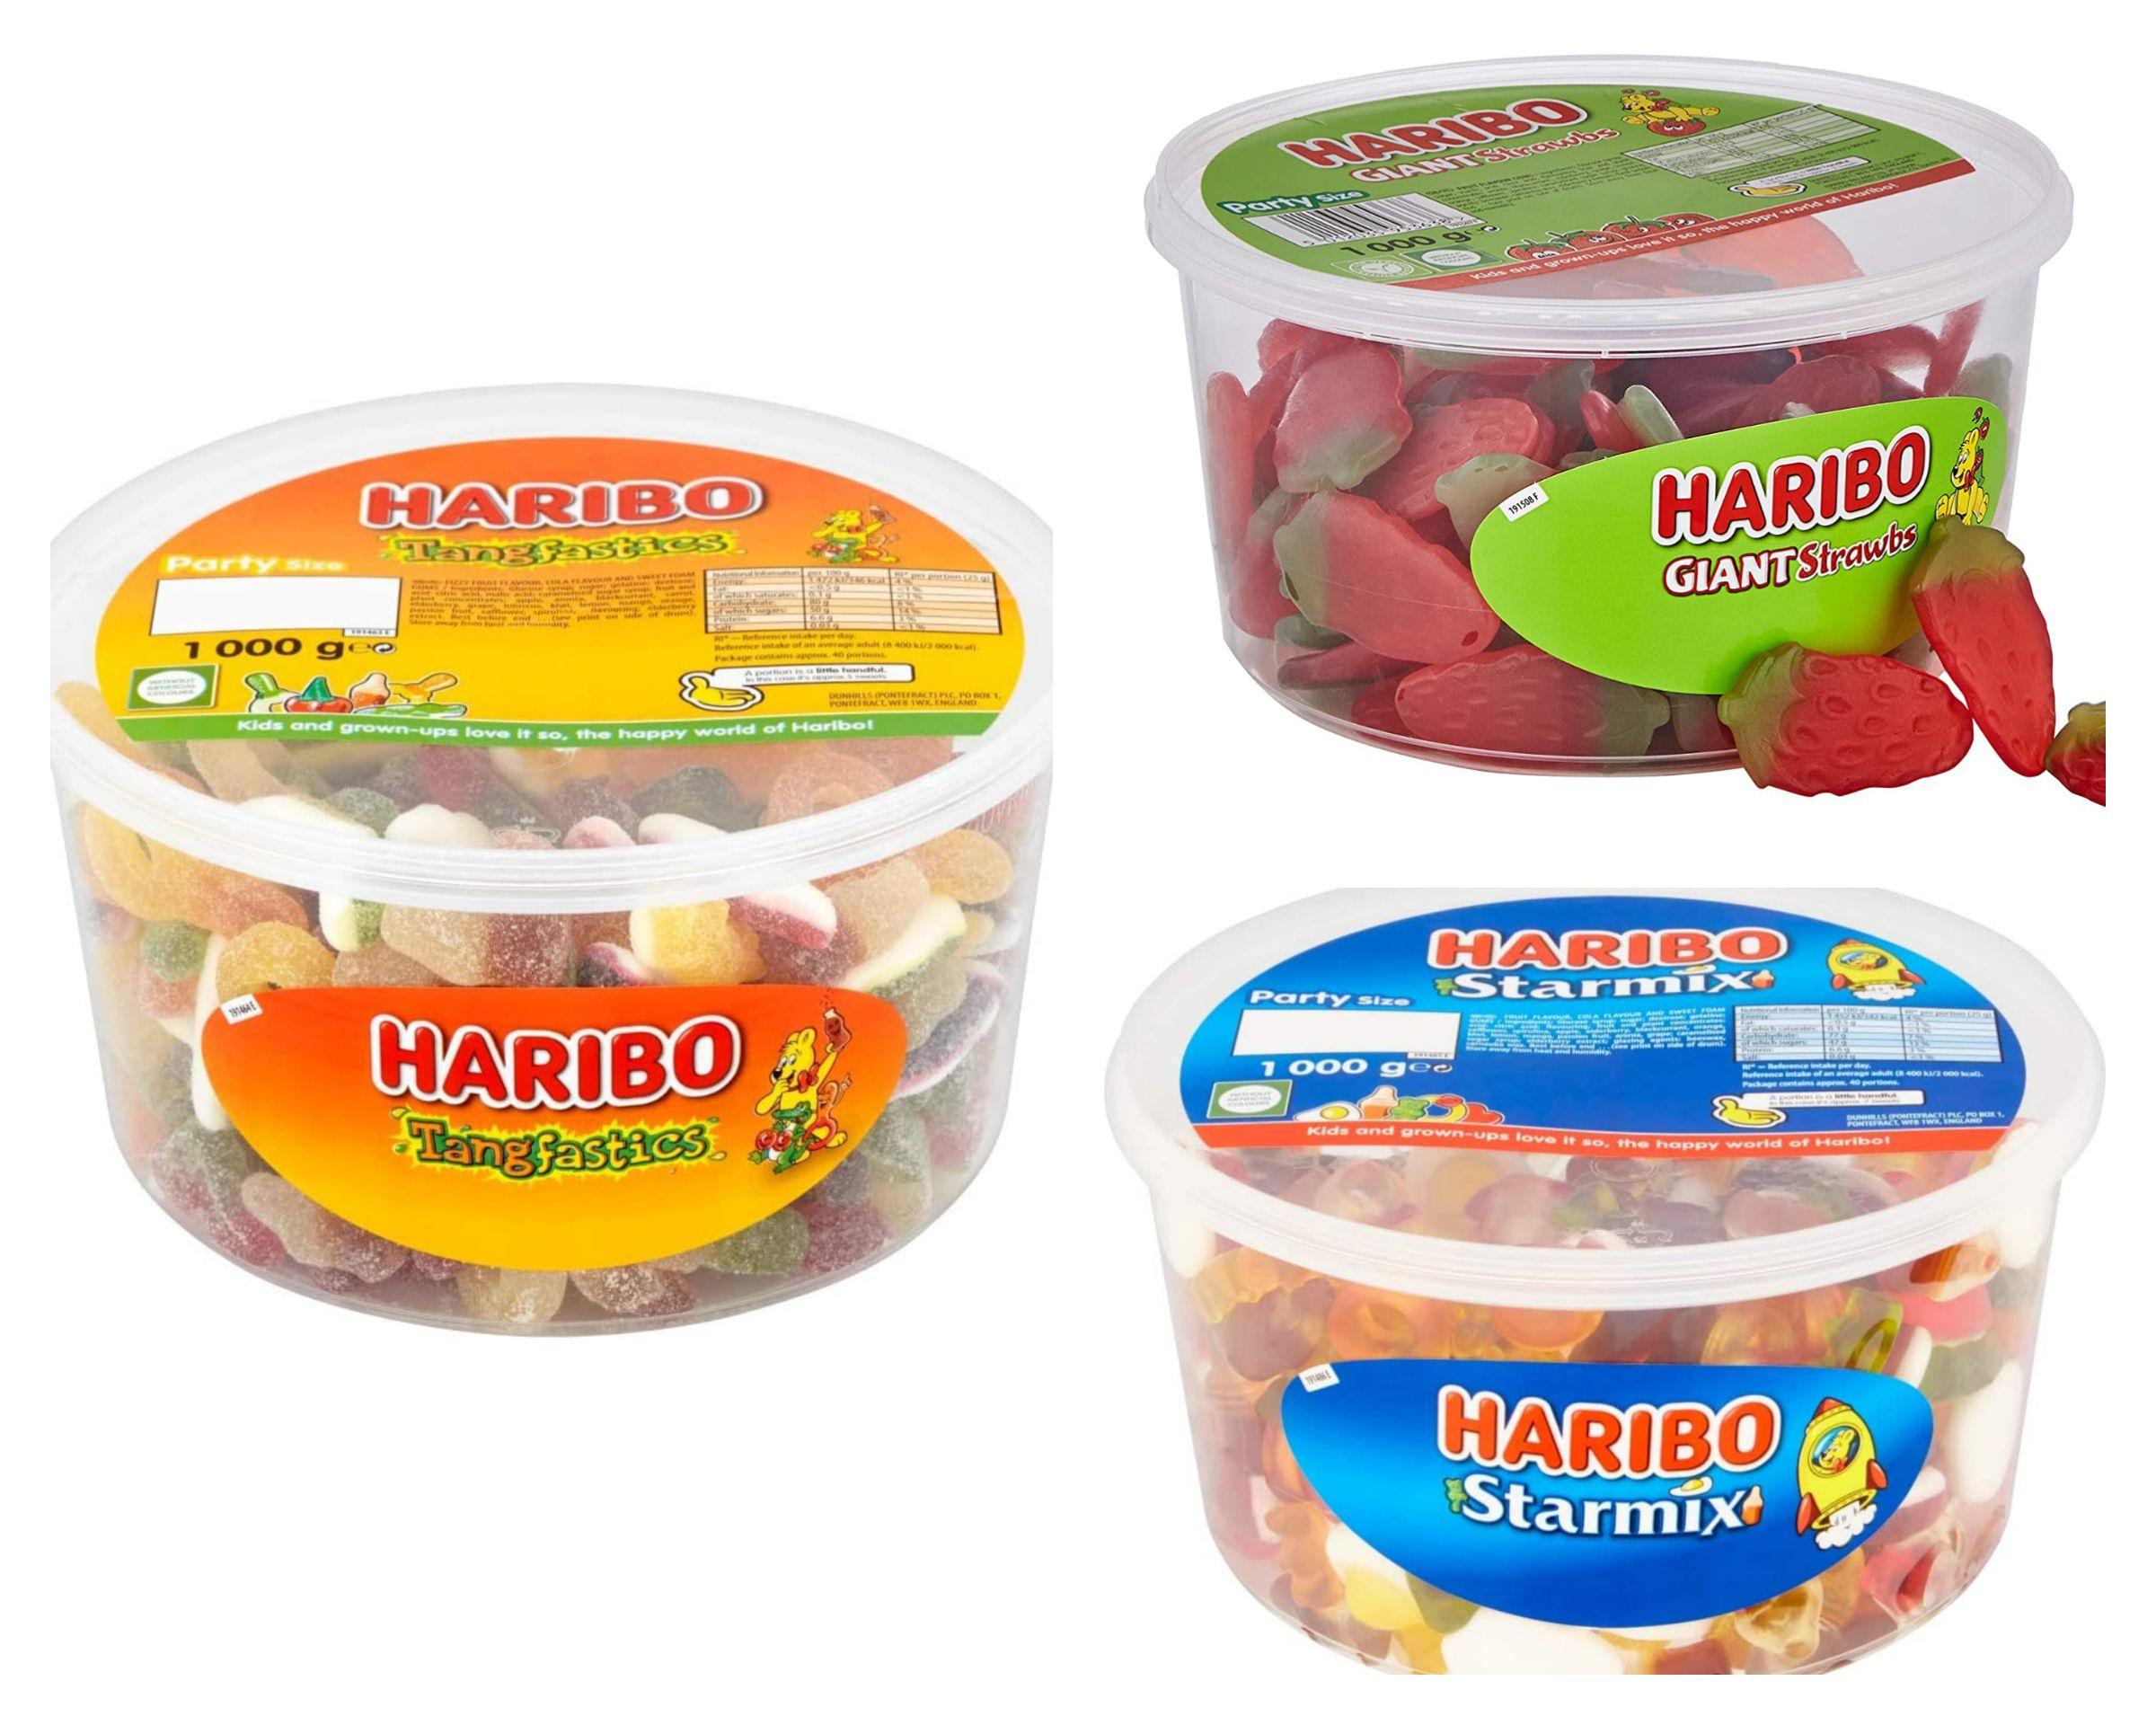 Haribo Tangfastics/Starmix/Giant strawberry Tub 1kg £4 each @ B&M Small Heath